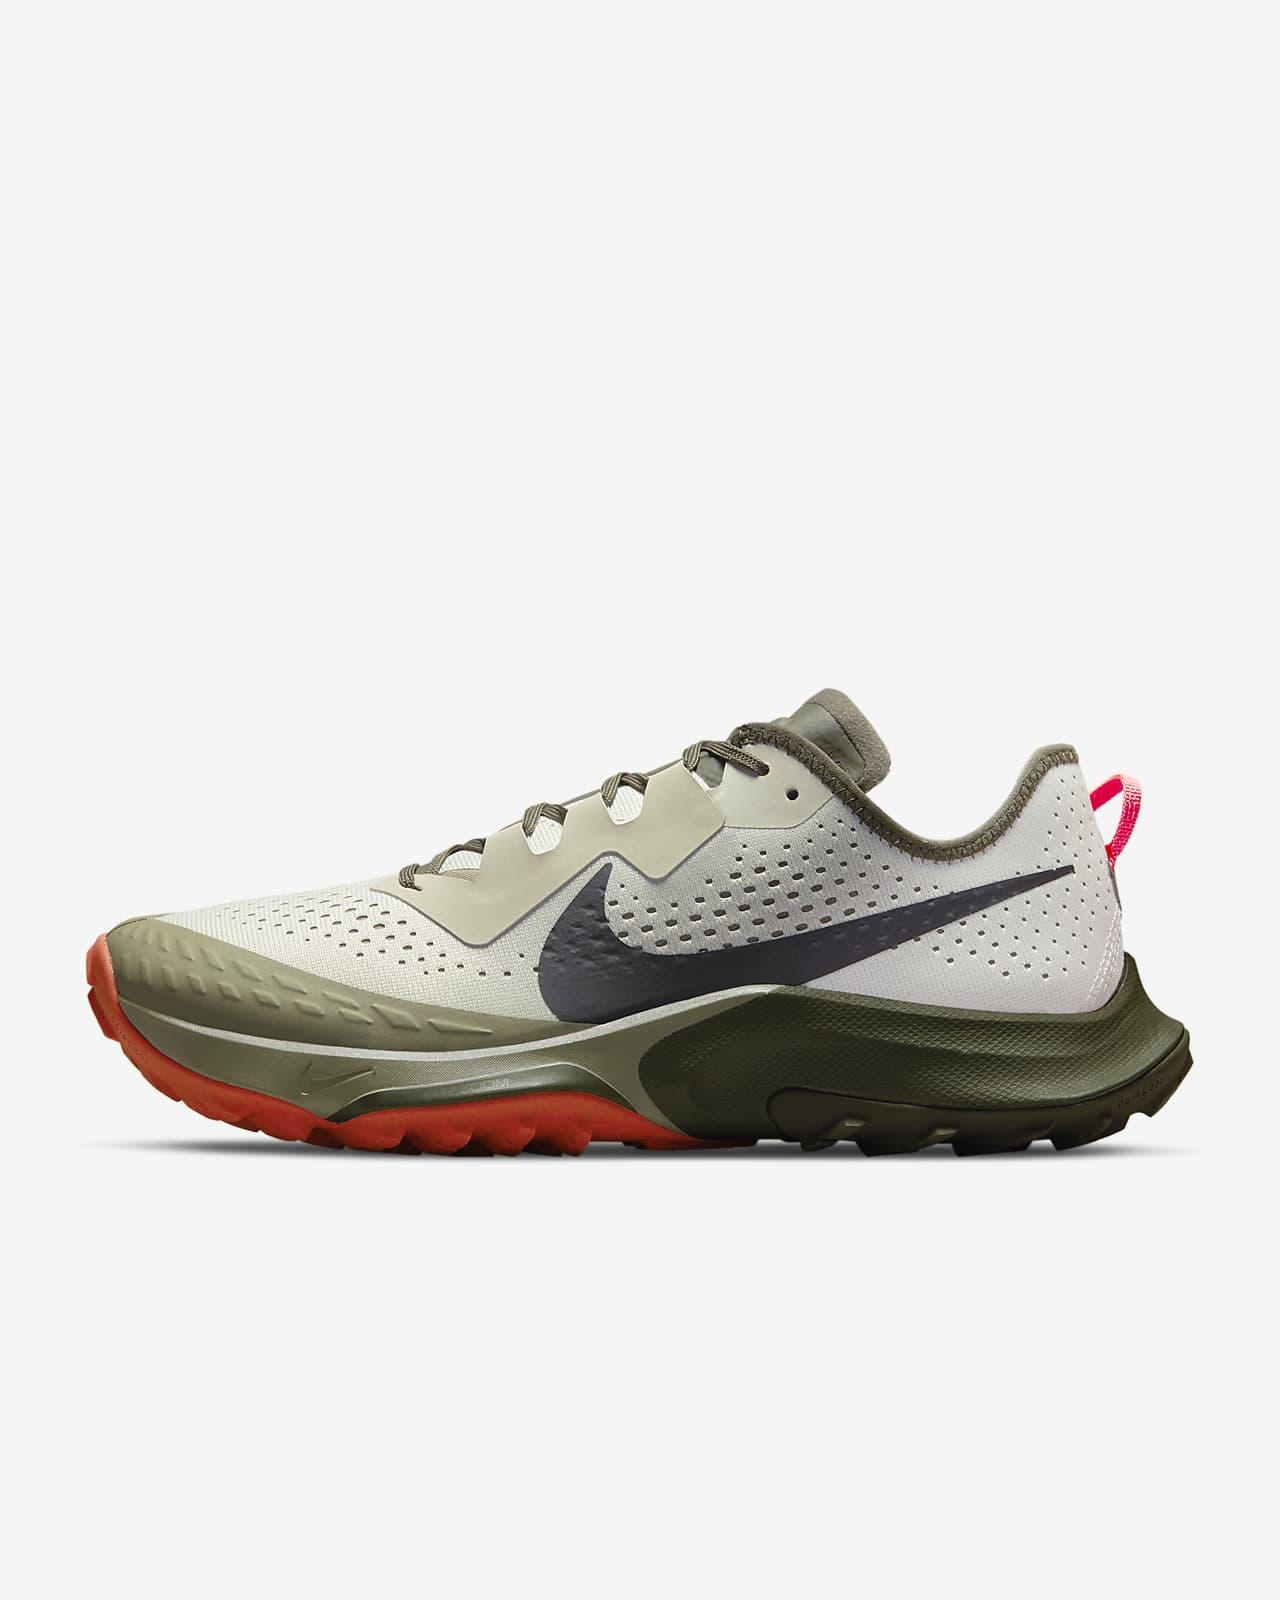 Calzado de trail running para hombre Nike Air Zoom Terra Kiger 7